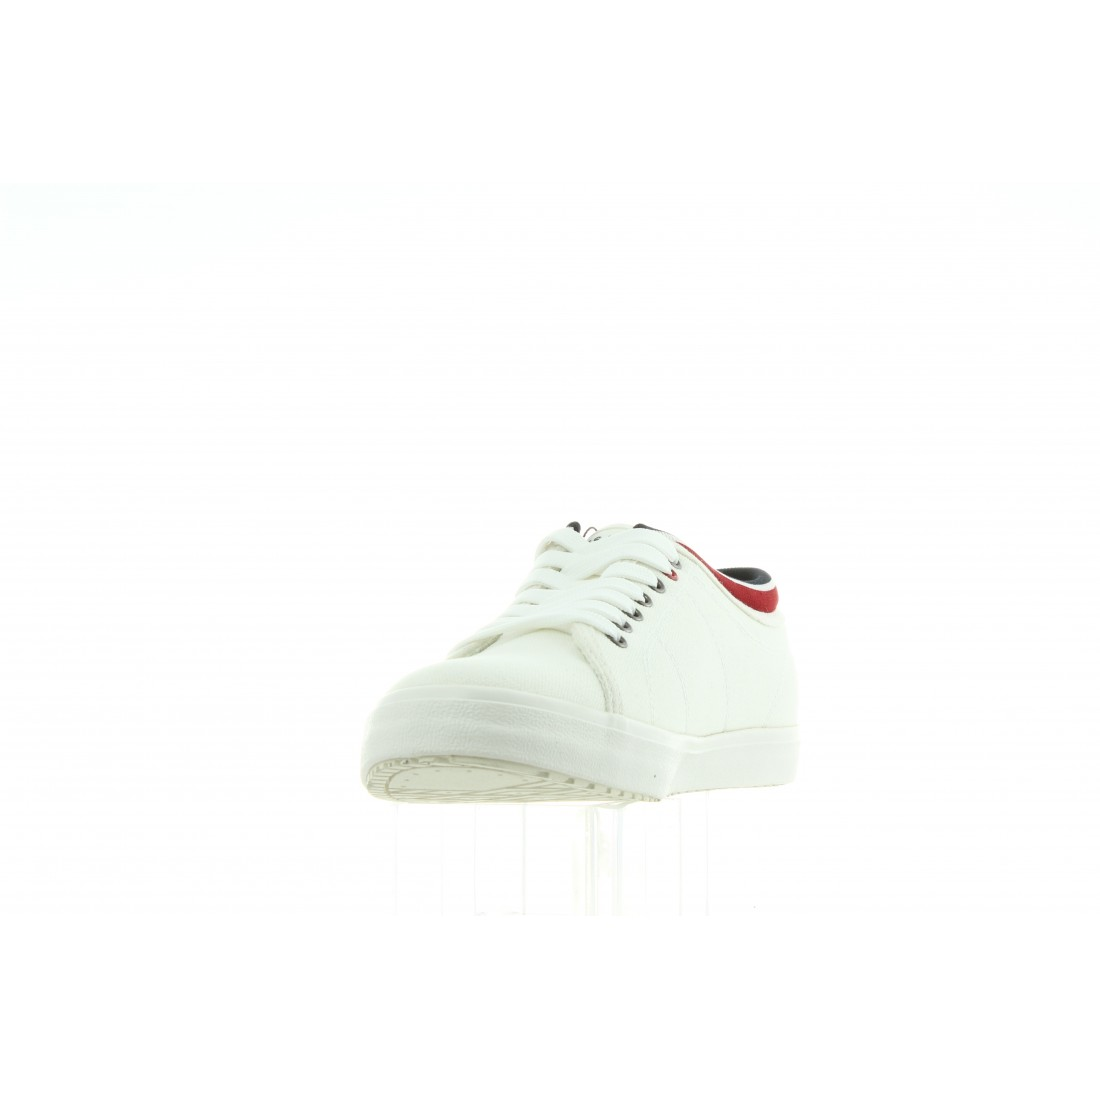 WOUCK7178W7/TY1 WHITE